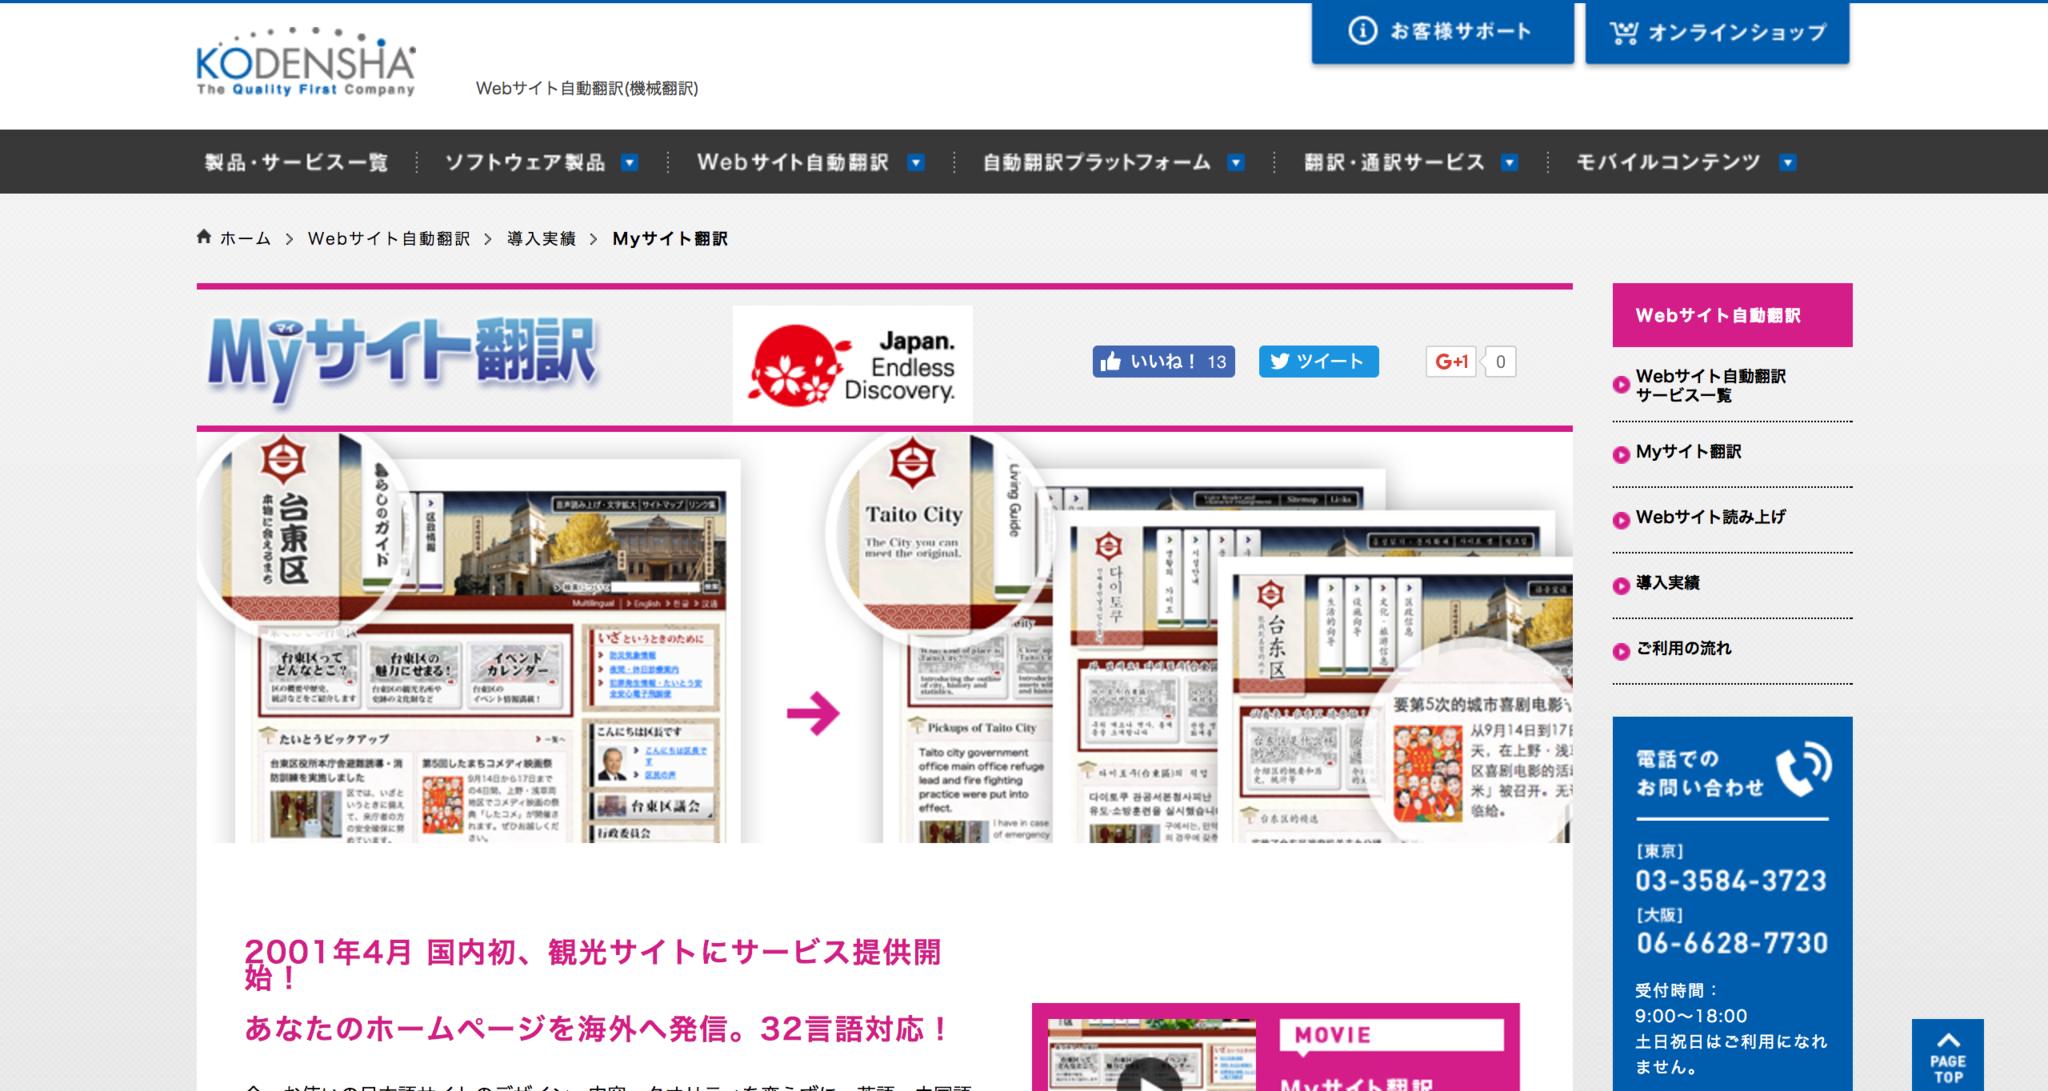 Myサイト翻訳|株式会社高電社.png